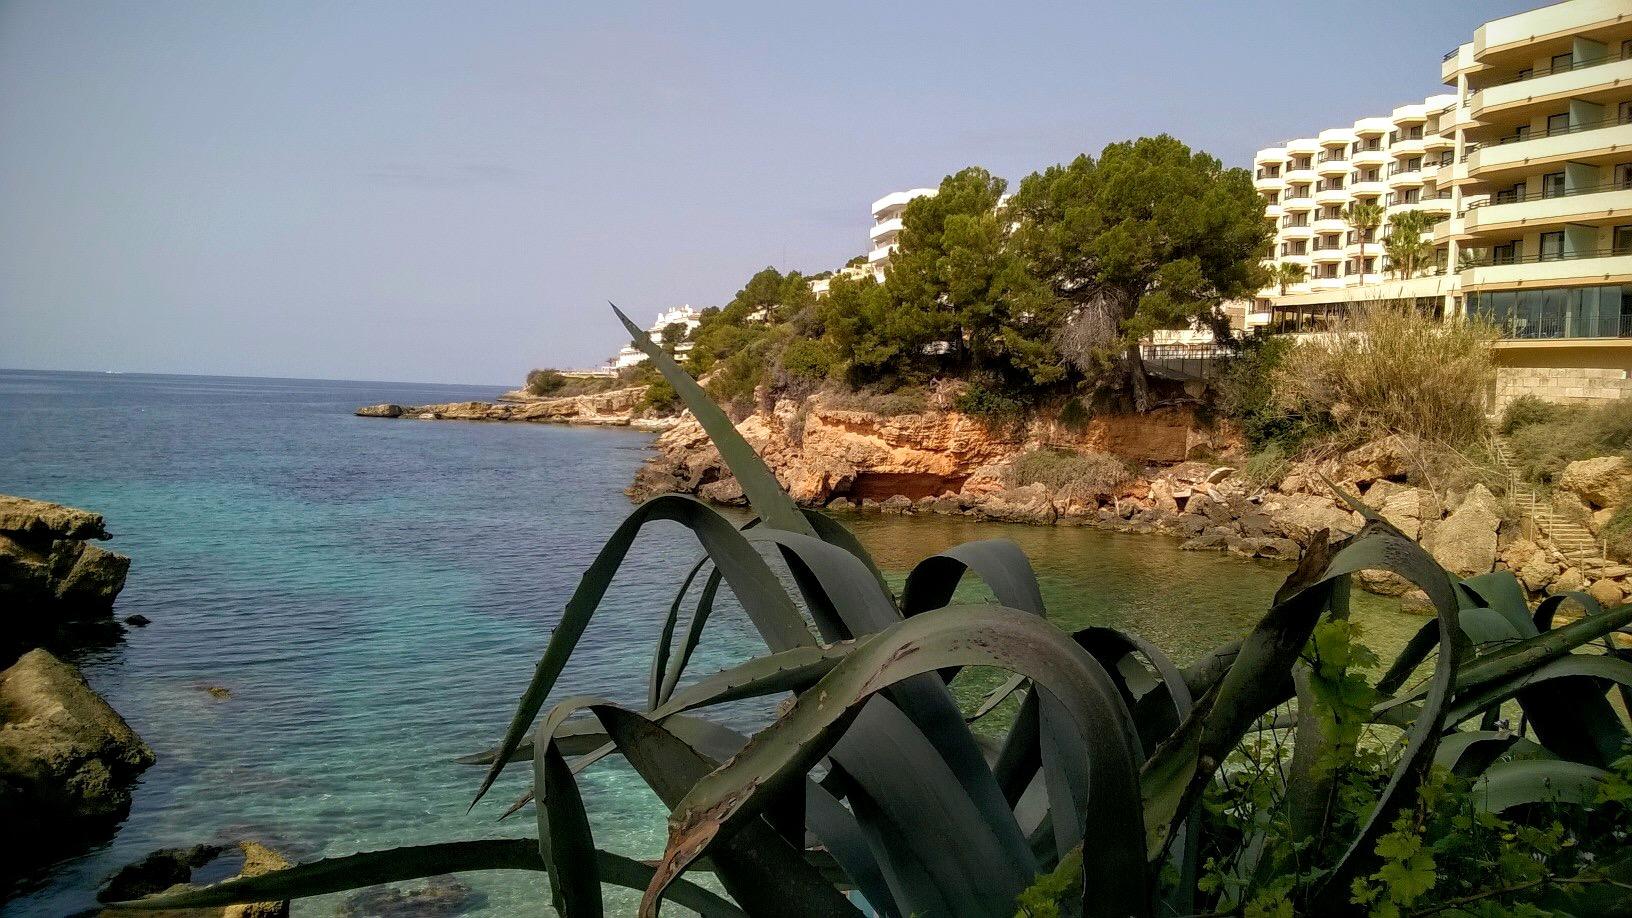 Santa Ponca Bay, Mallorca